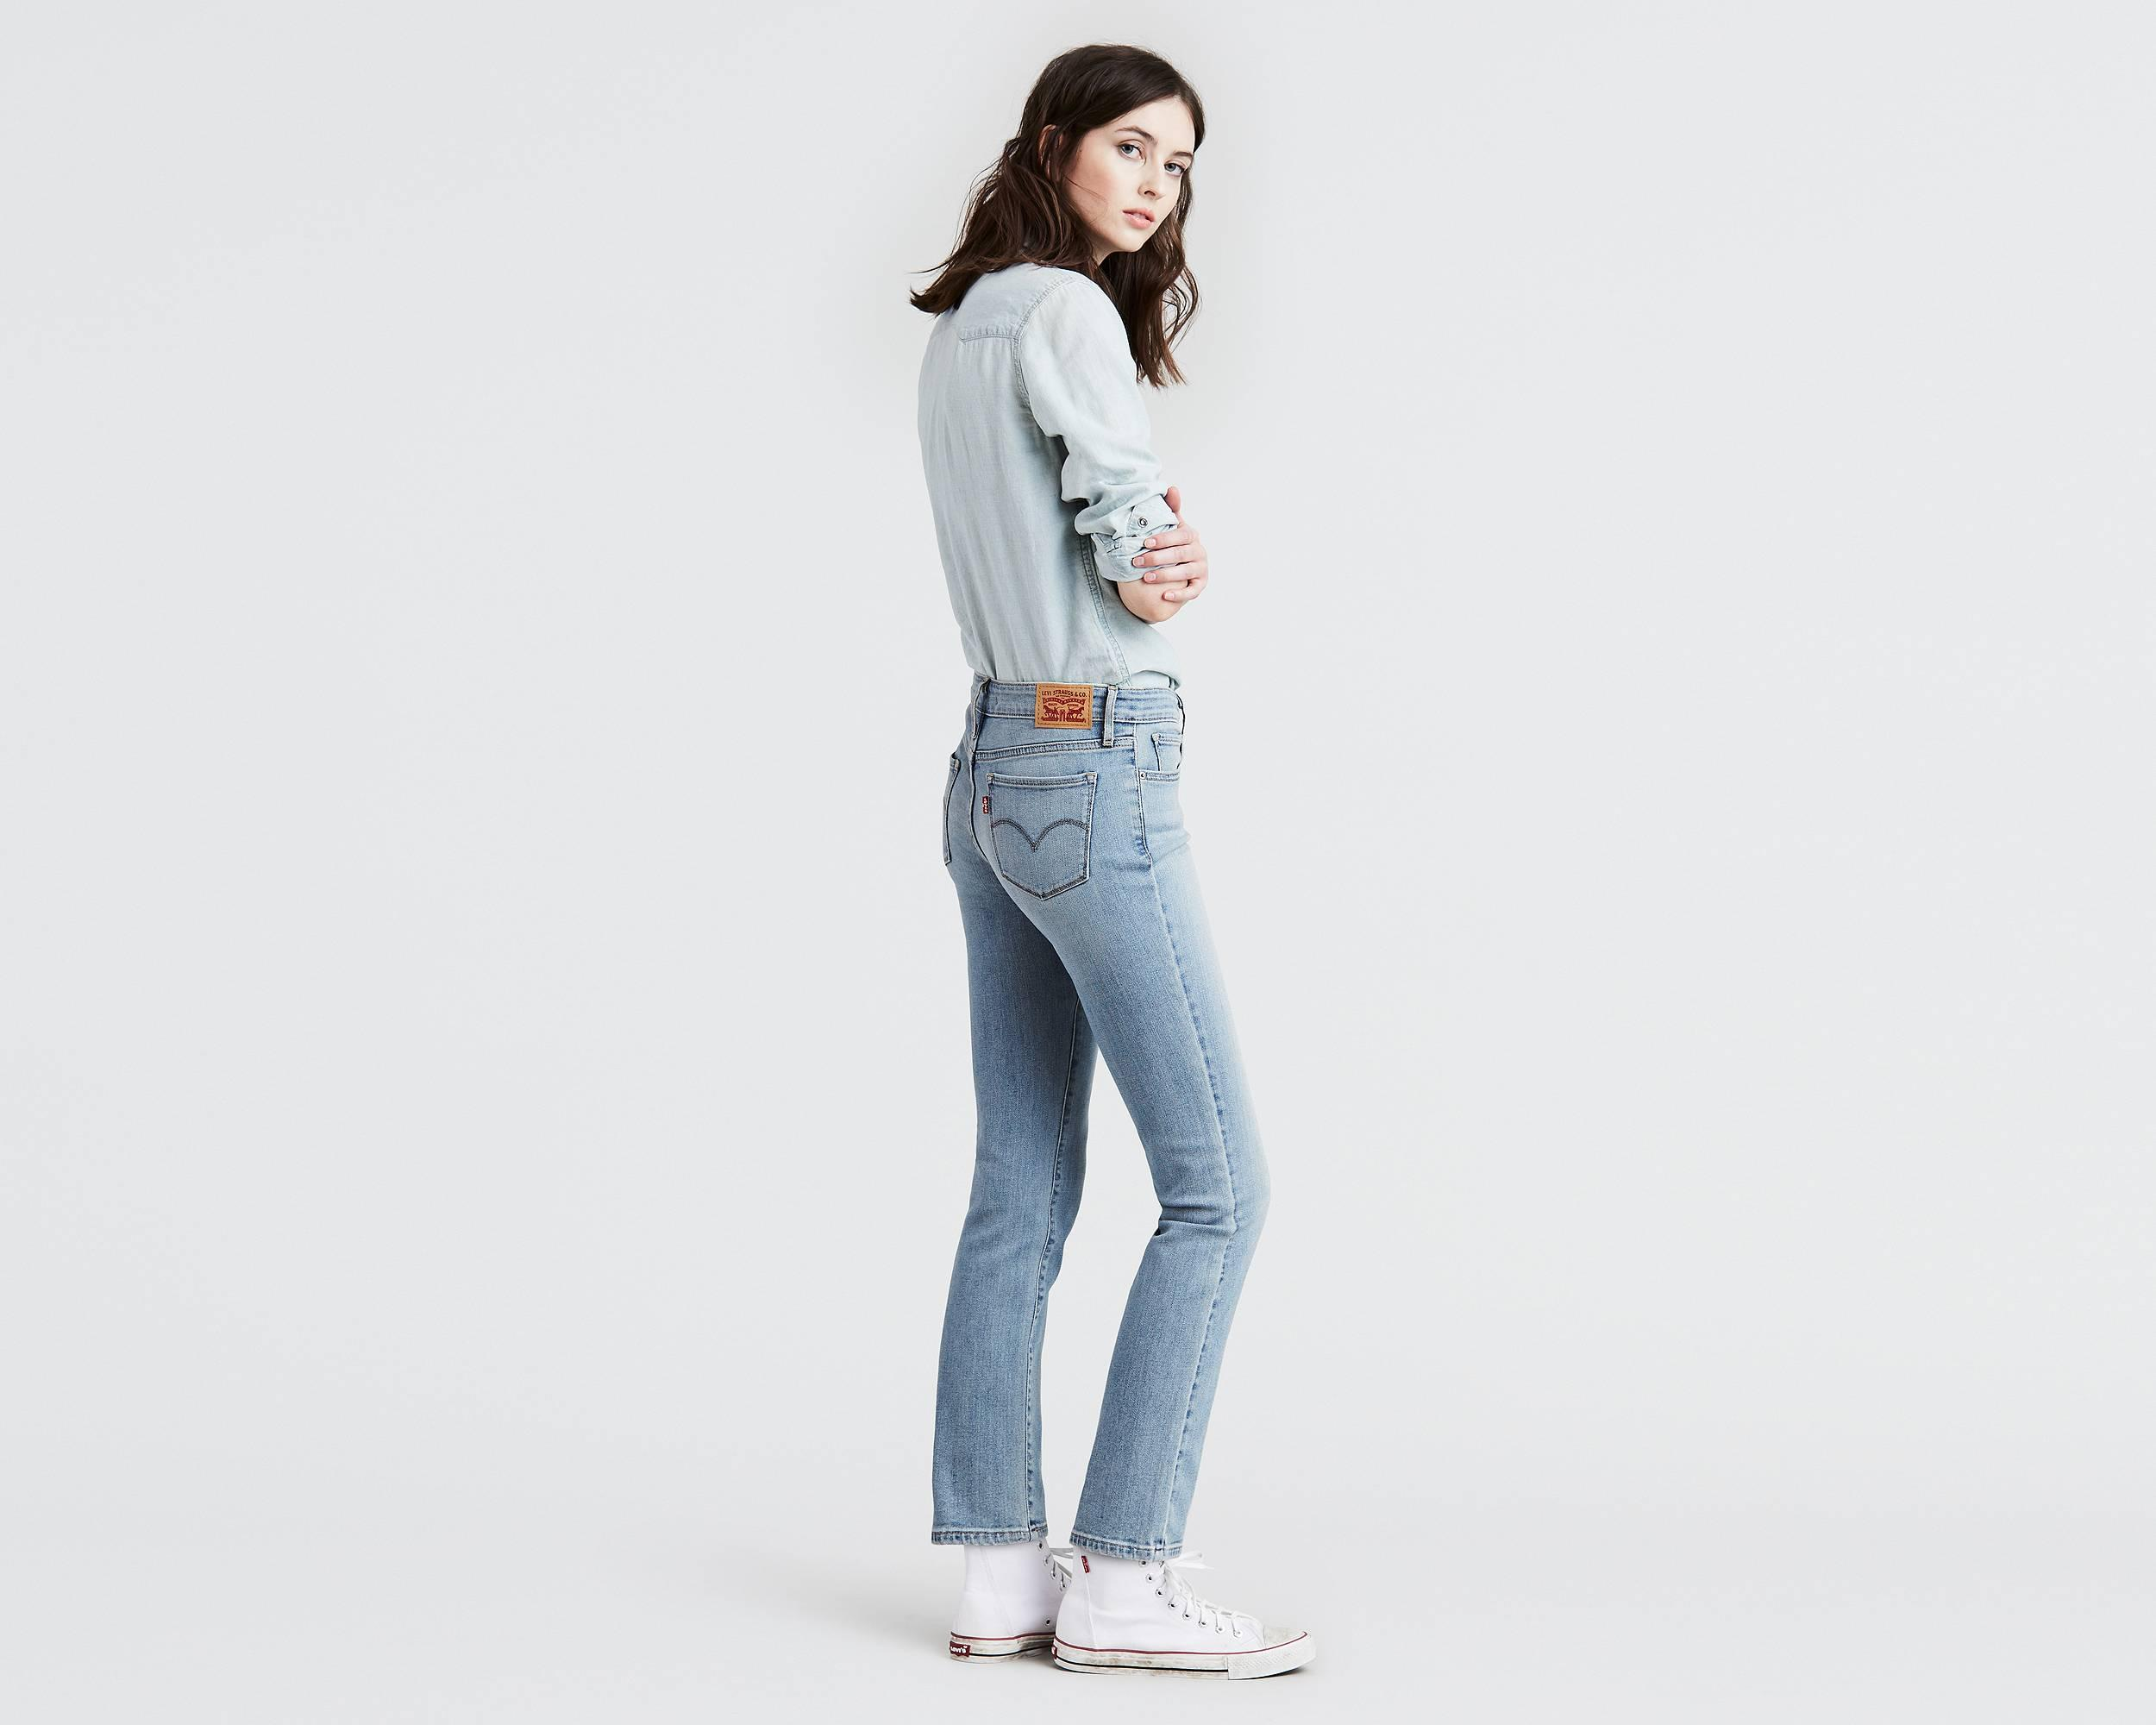 e2affae7181 712 Slim Jeans - Levi's Jeans, Jackets & Clothing